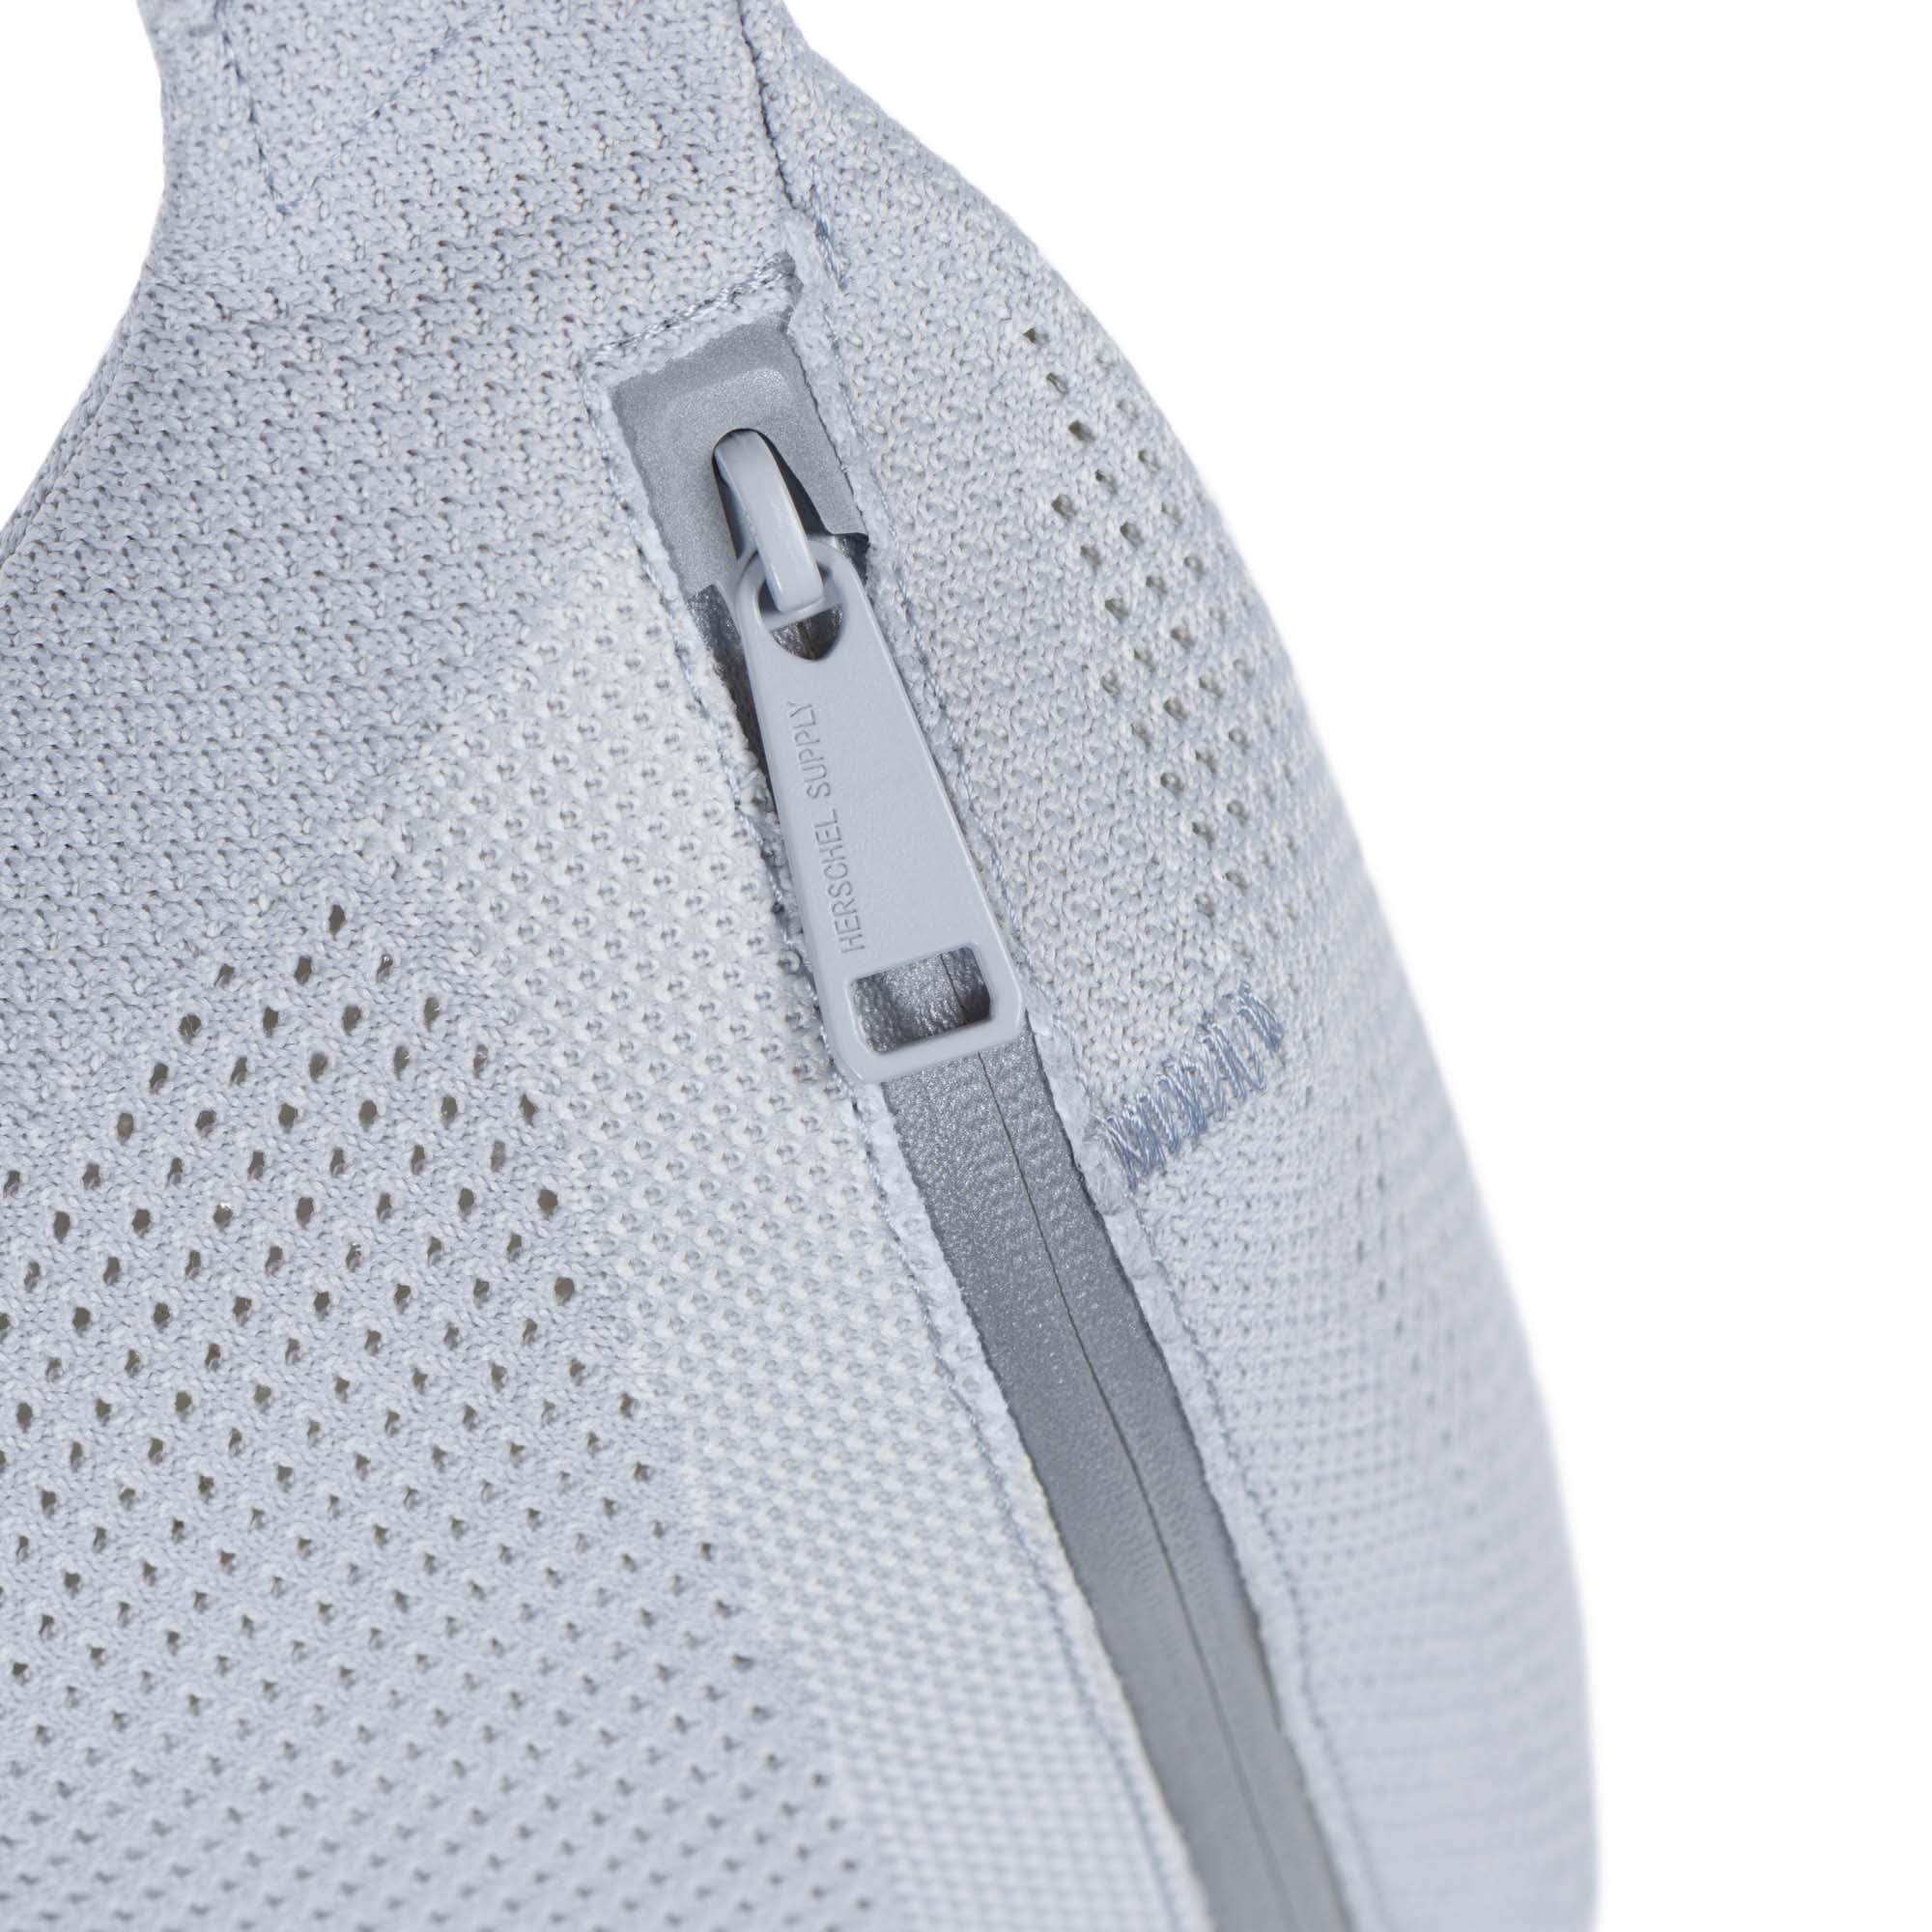 1e6e63e076e0 ApexKnit™ technology  Waterproof zipper with Icon pull-tab and reflective  dock ...